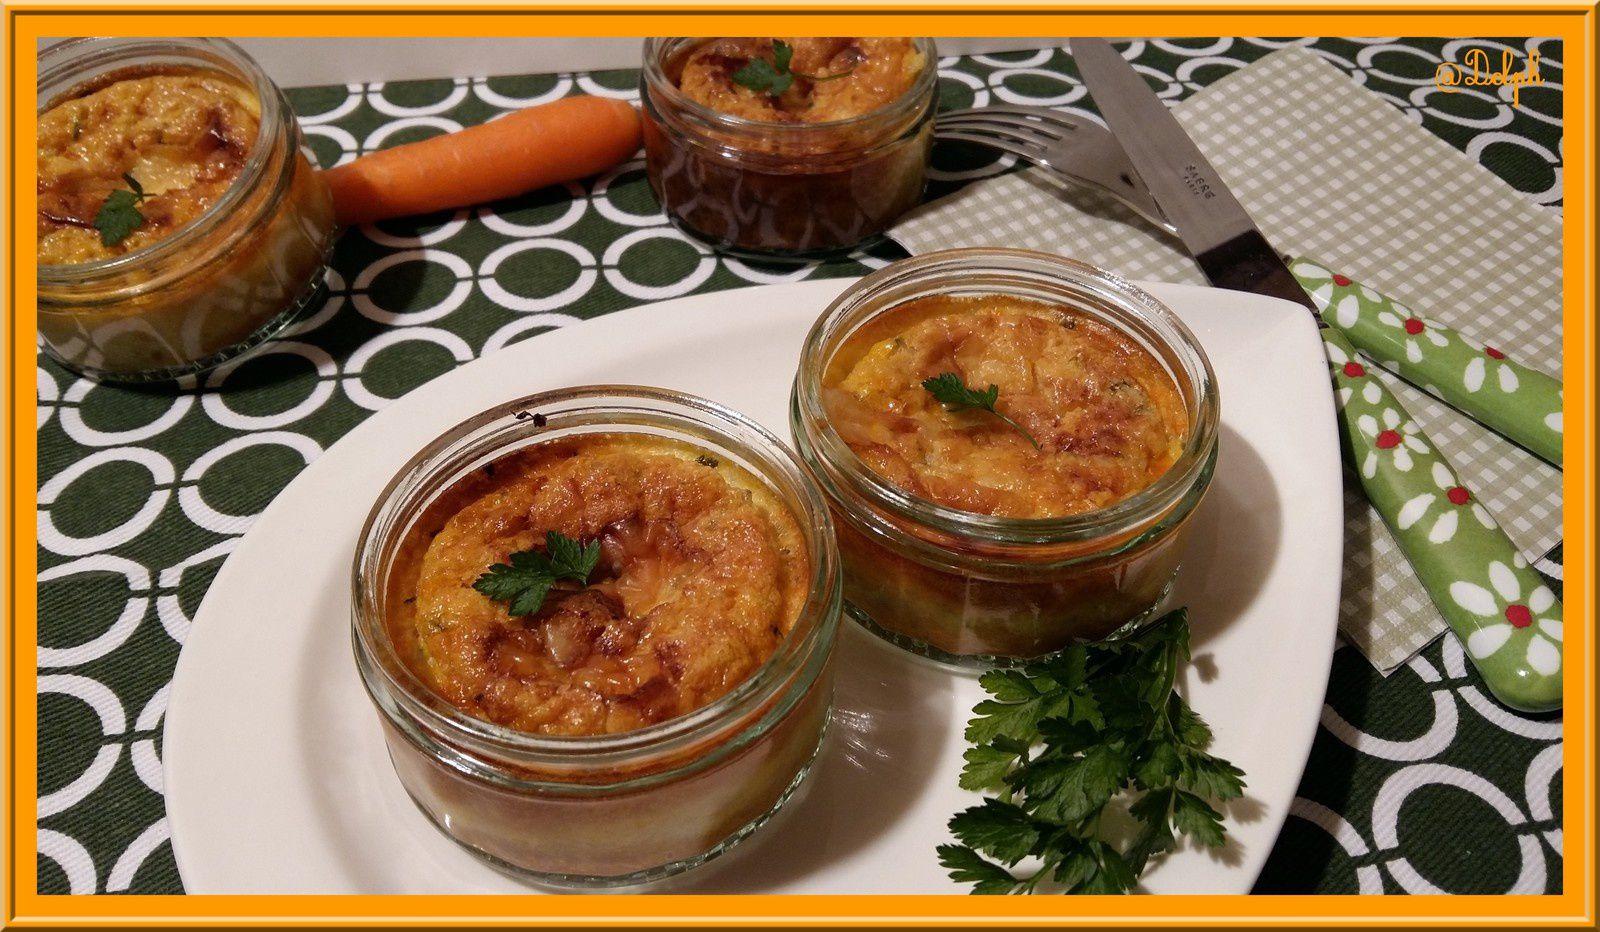 Flan à la carotte, persil et cumin